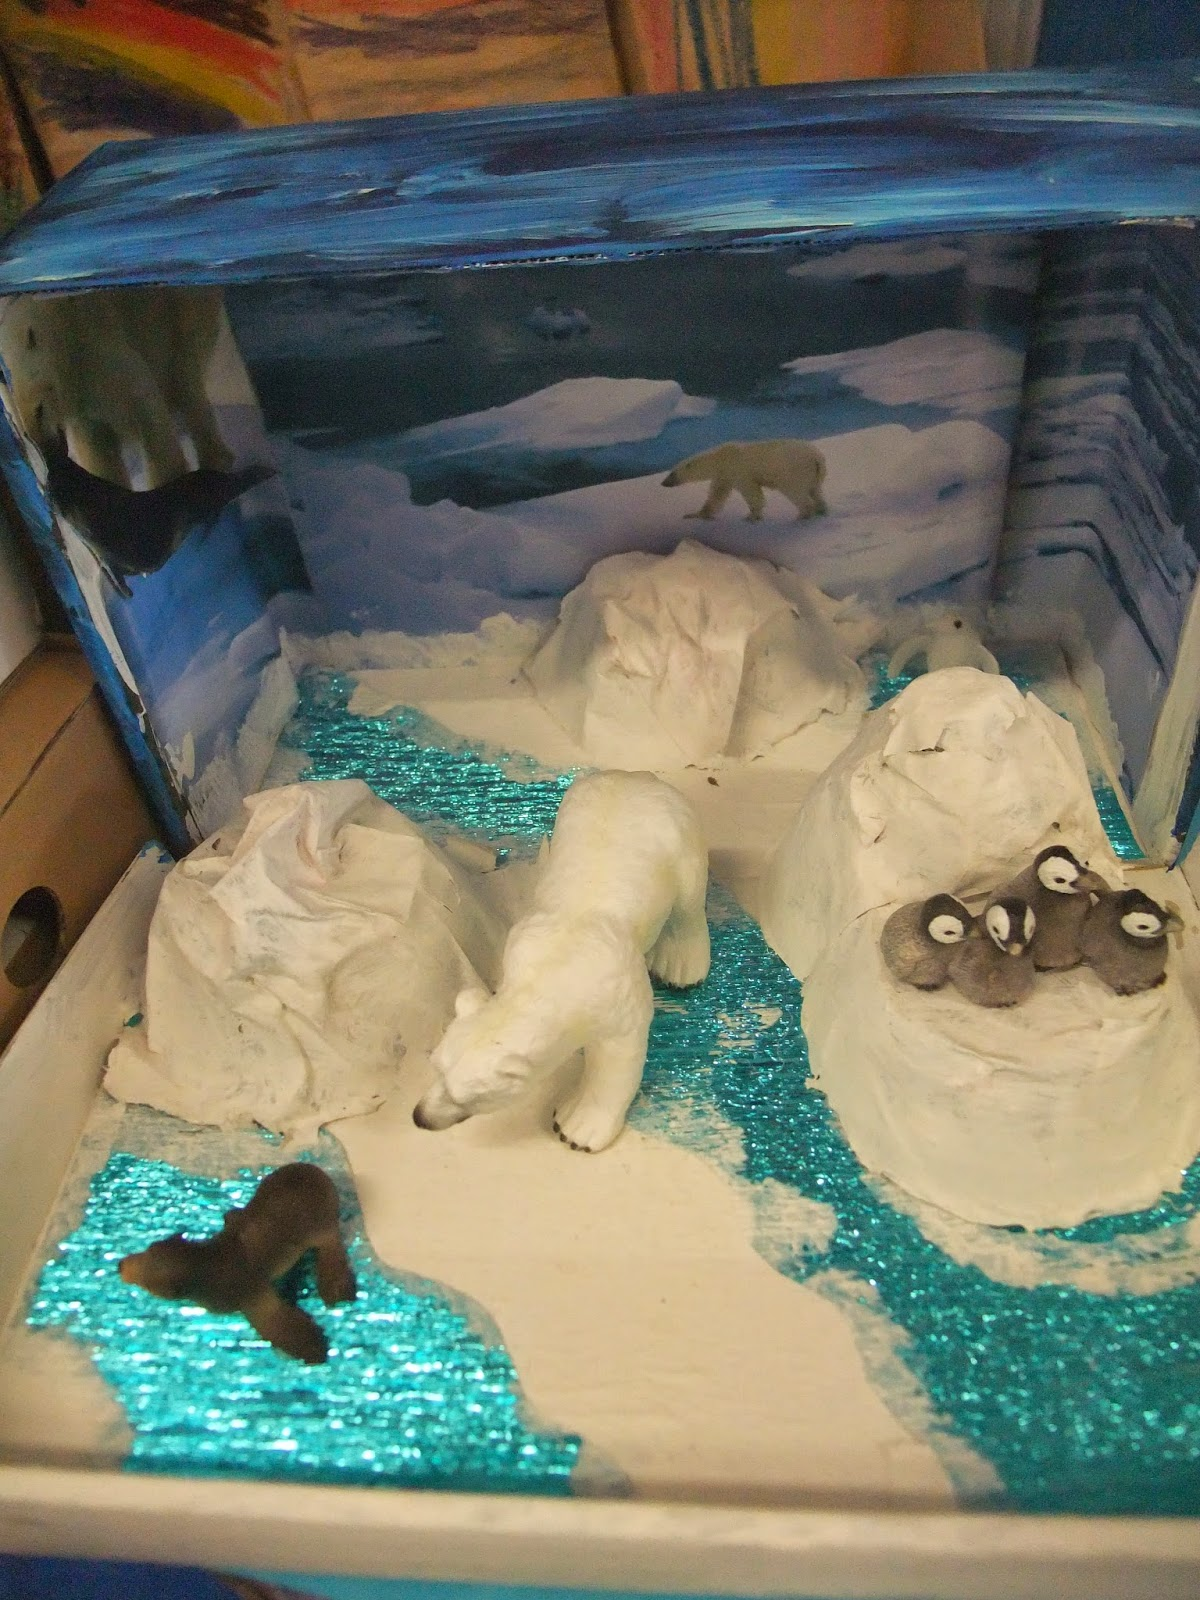 Arctic wolf diorama - photo#28